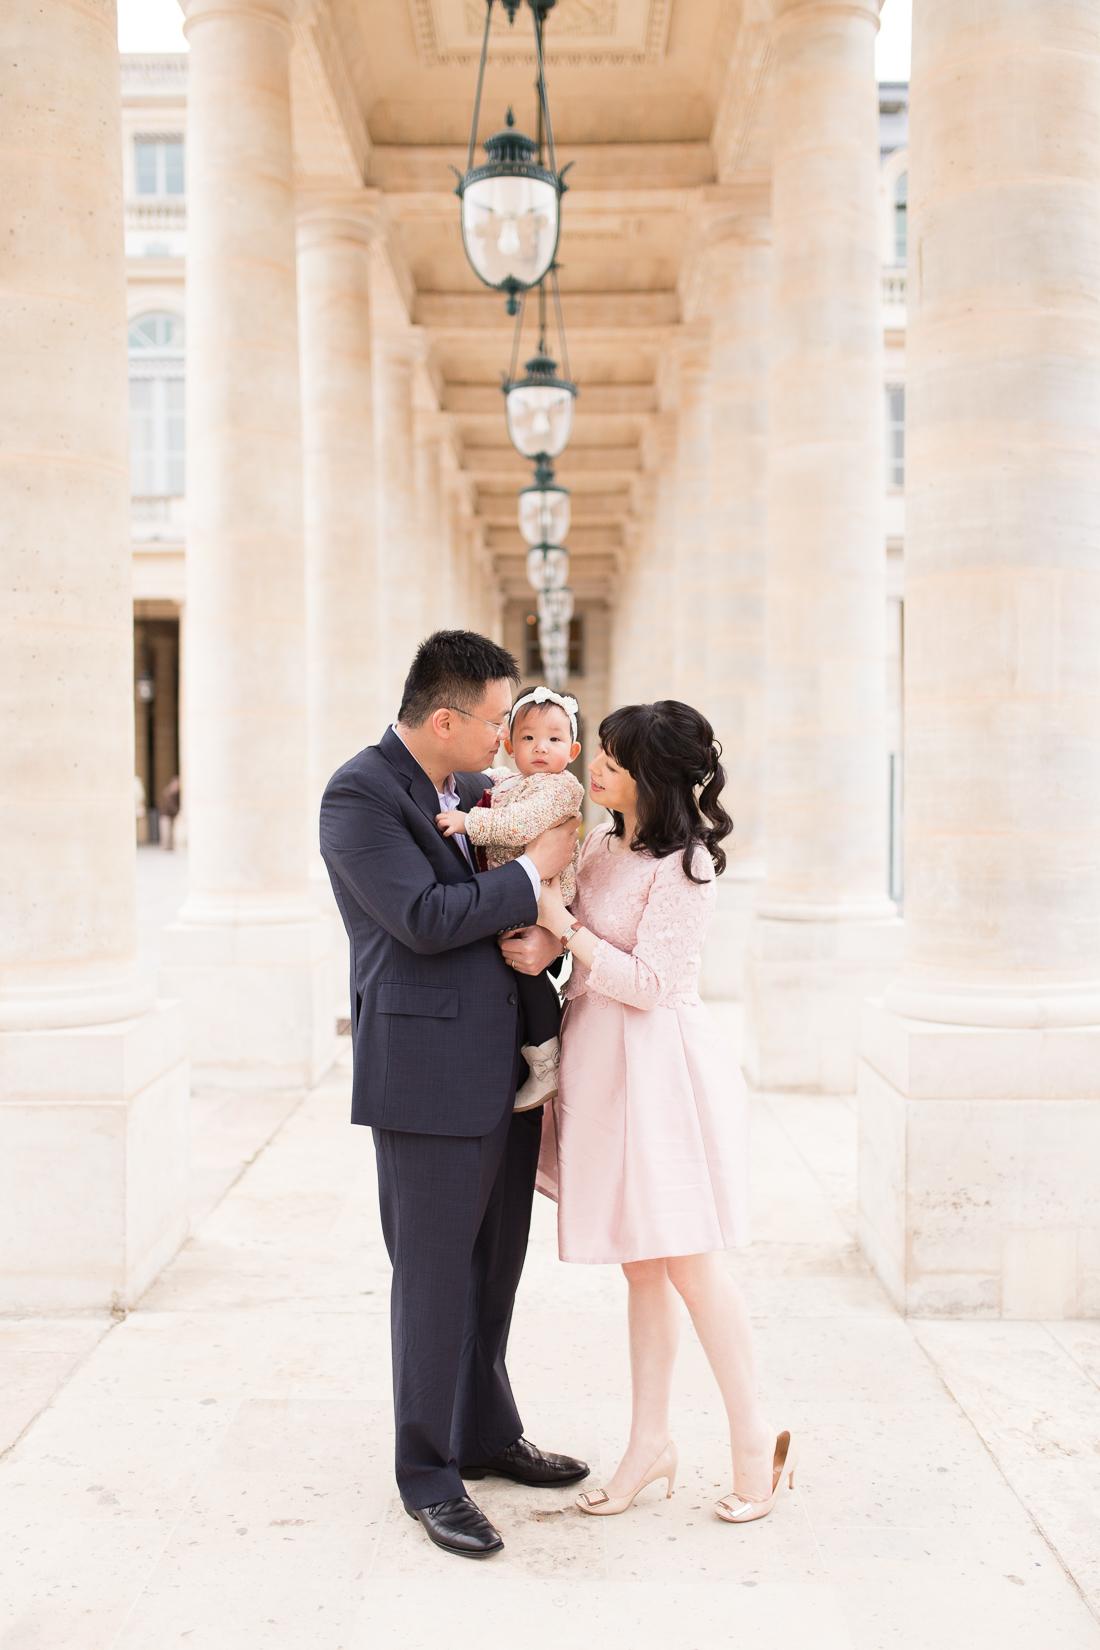 spring-fall-family-maternity-paris-palais-royal-louvre-photo-session-inspiration-1